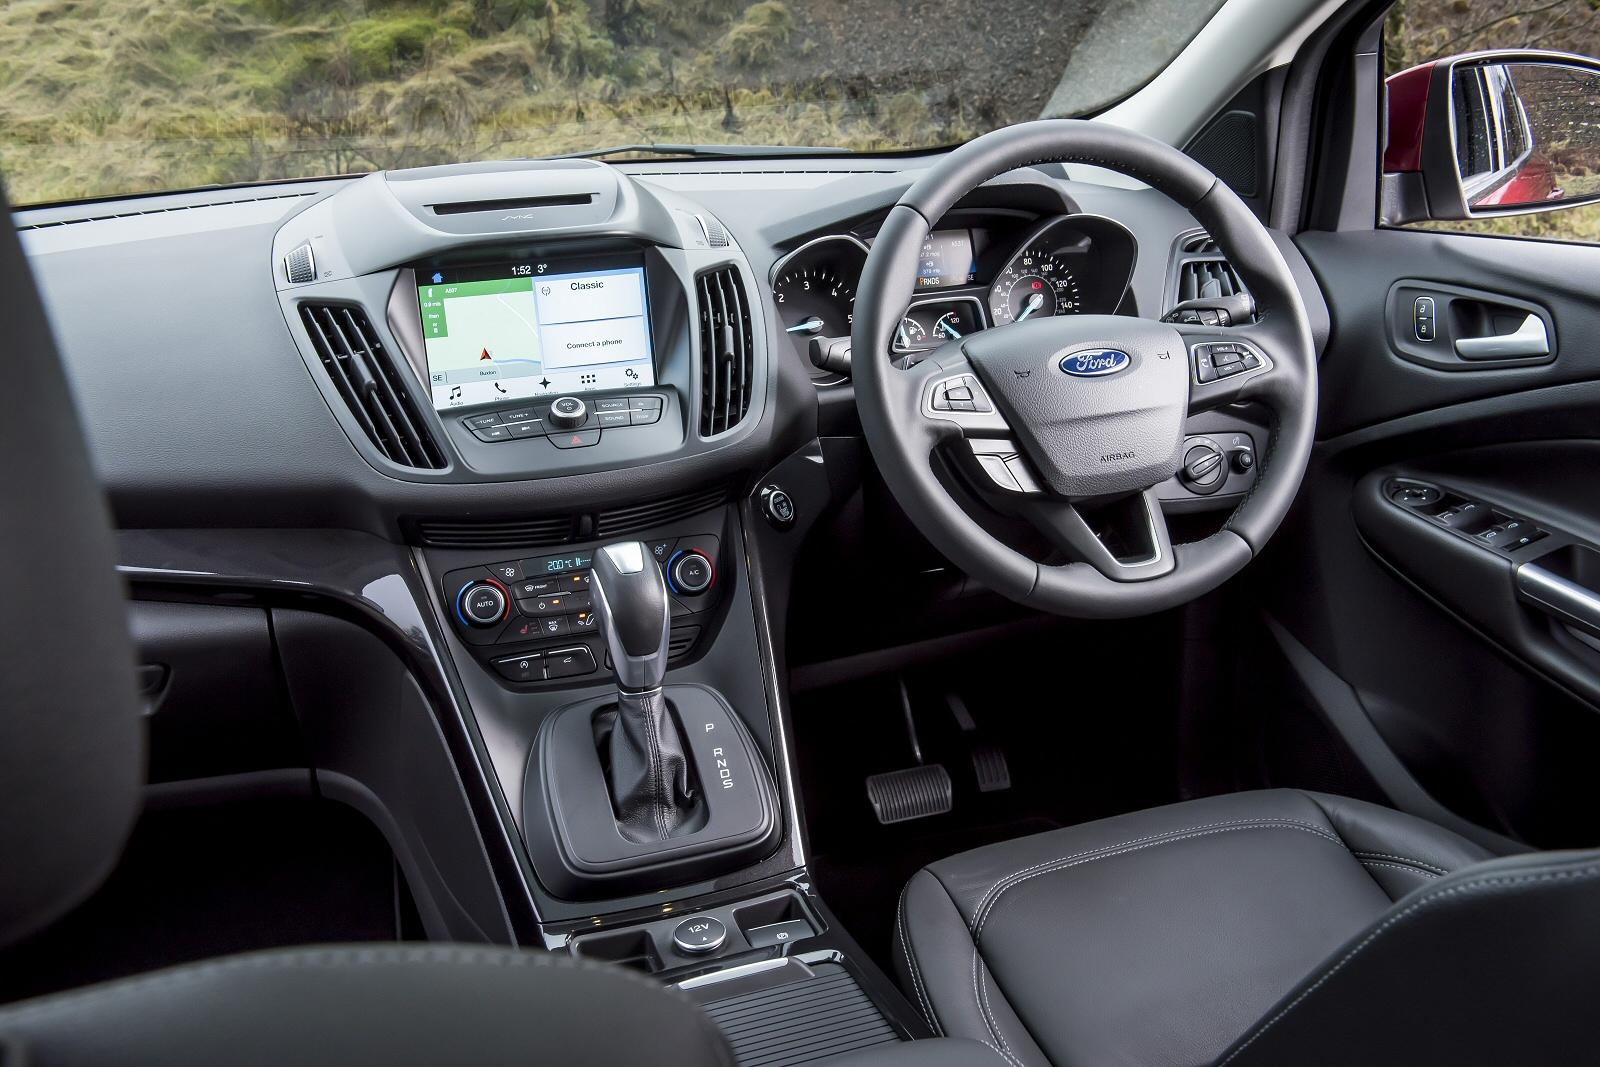 new ford kuga 1 5 ecoboost titanium 5dr 2wd petrol estate for sale rh bristolstreet co uk ford kuga instruction manual ford kuga owners manual